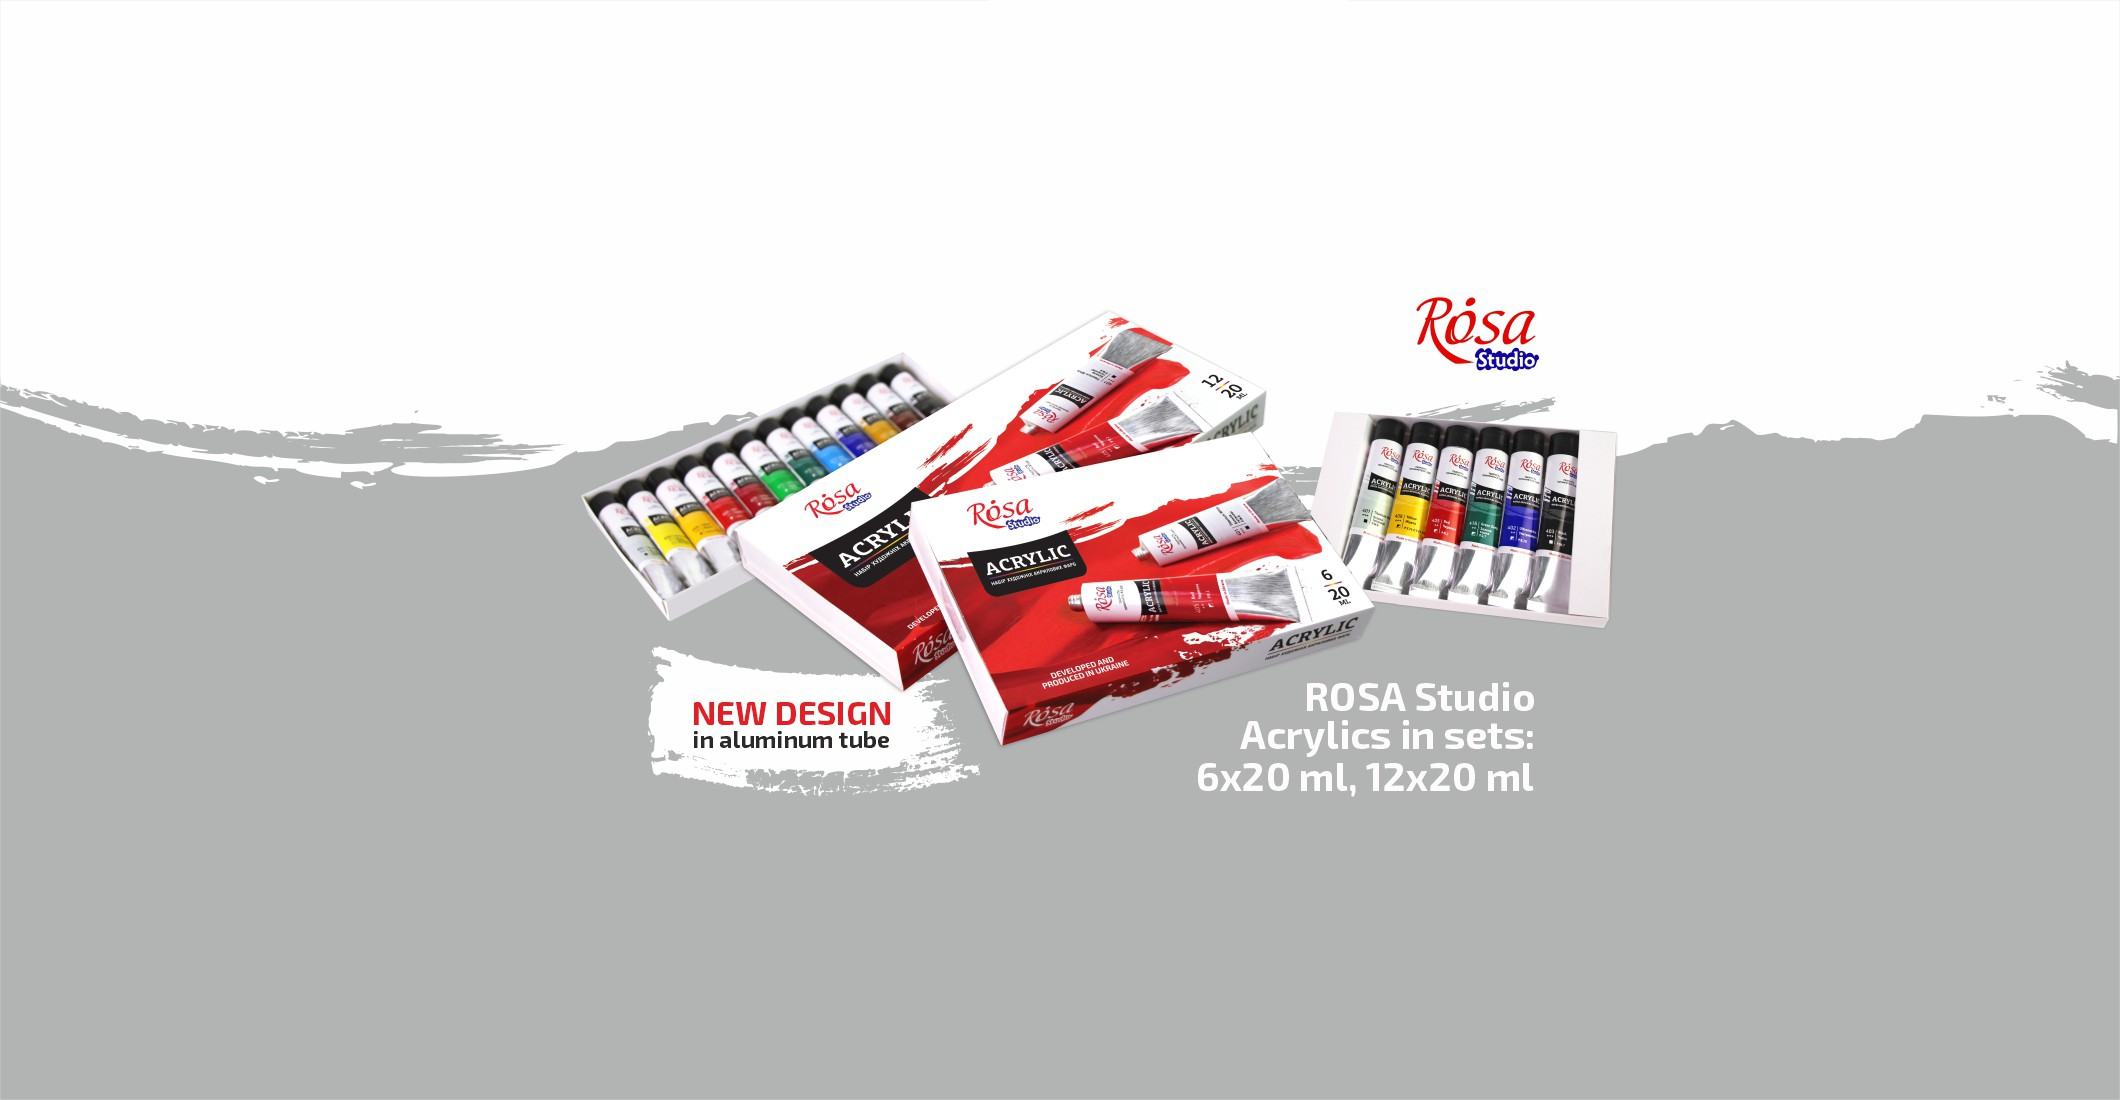 ROSA Studio Acrylics in aluminum tube